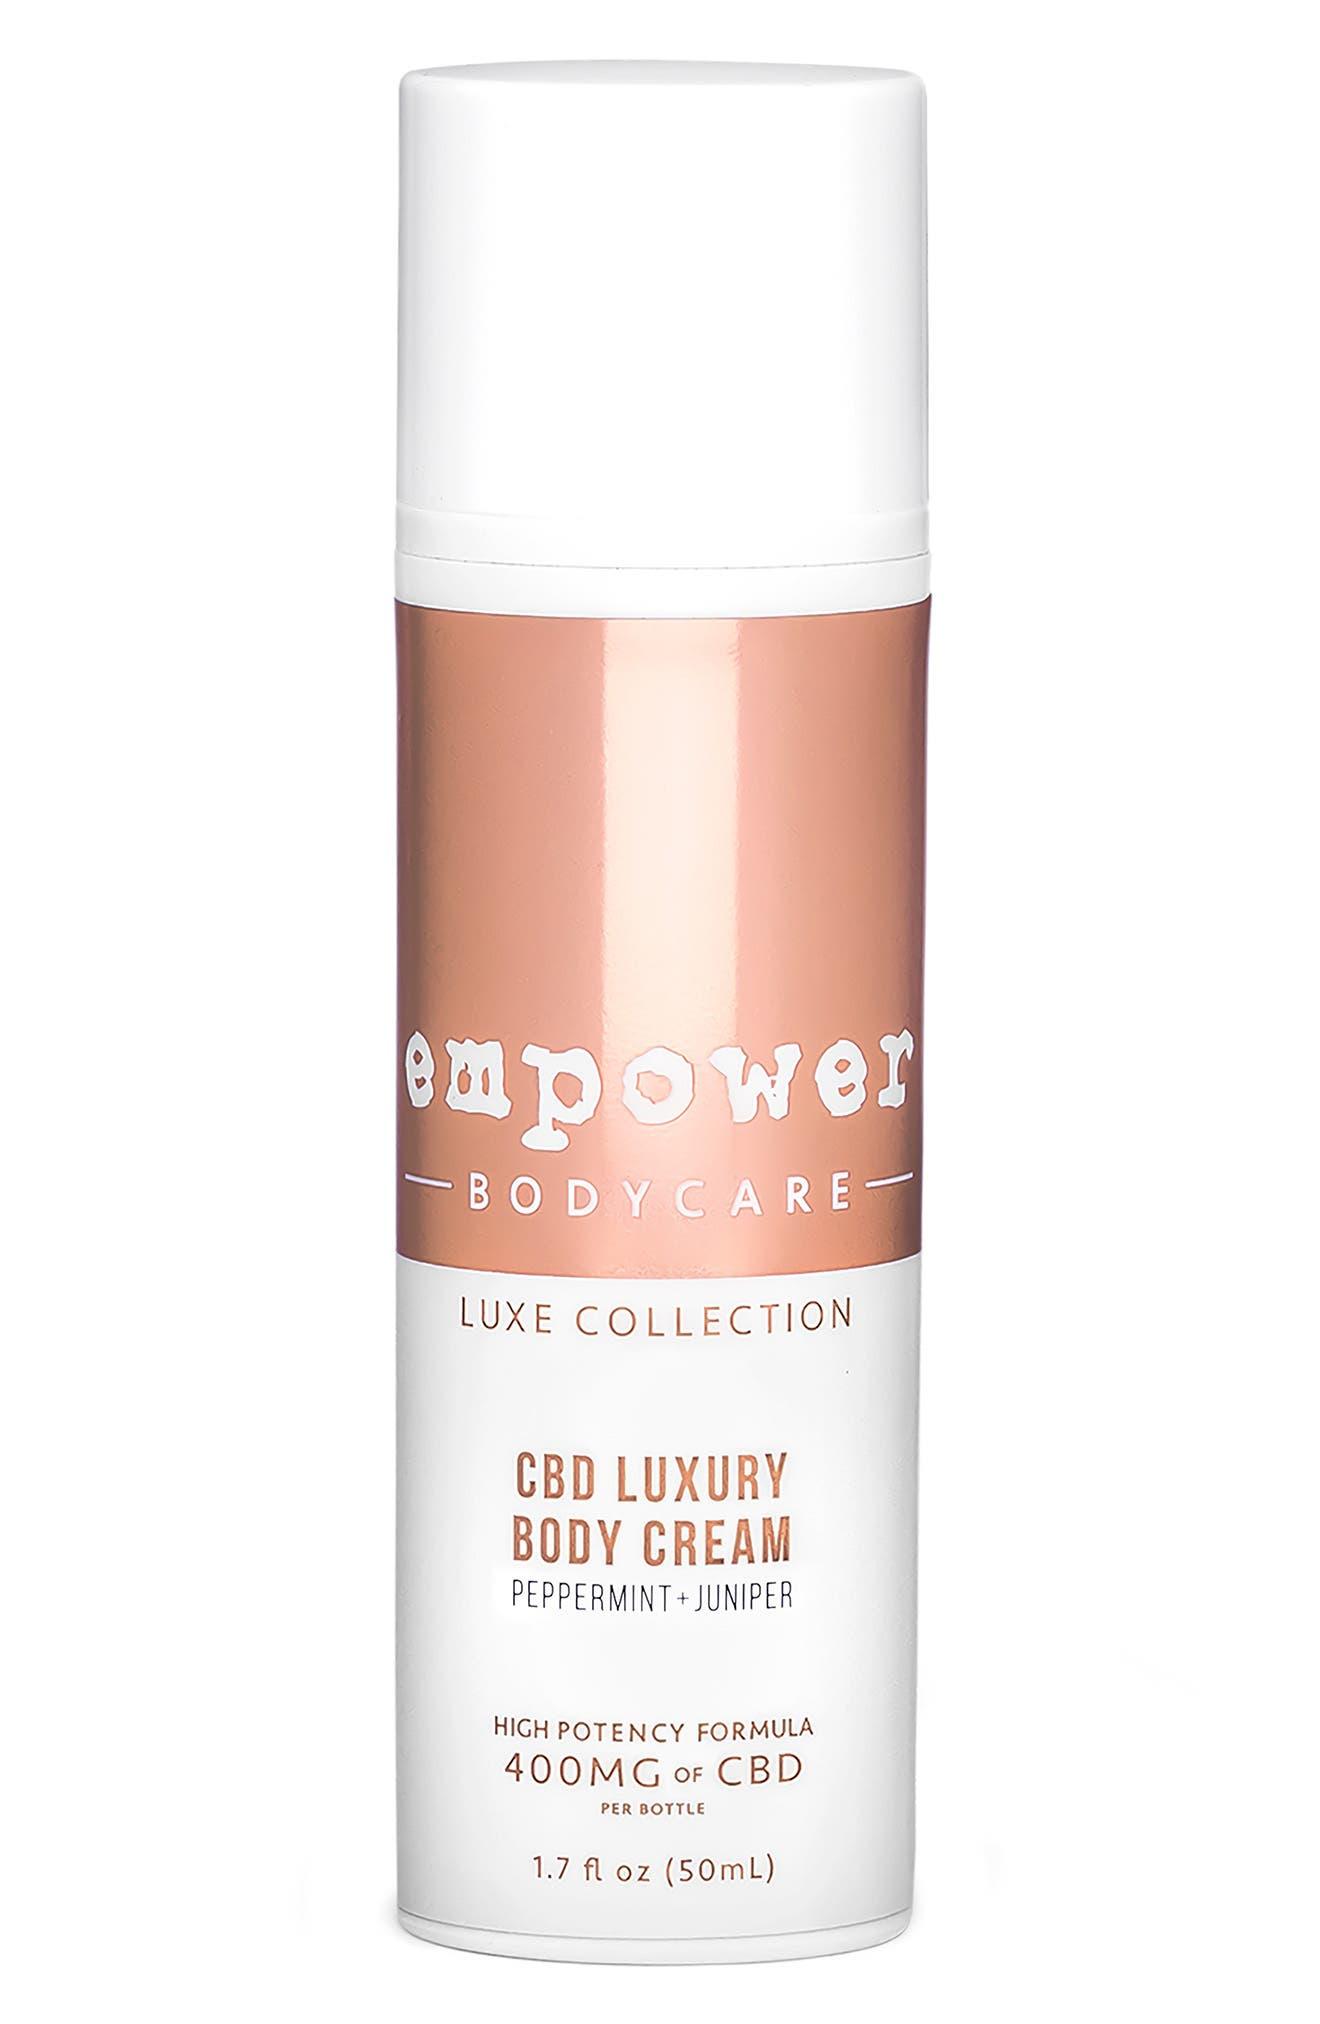 Peppermint Juniper CBD Luxury Body Cream in No Color at Nordstrom